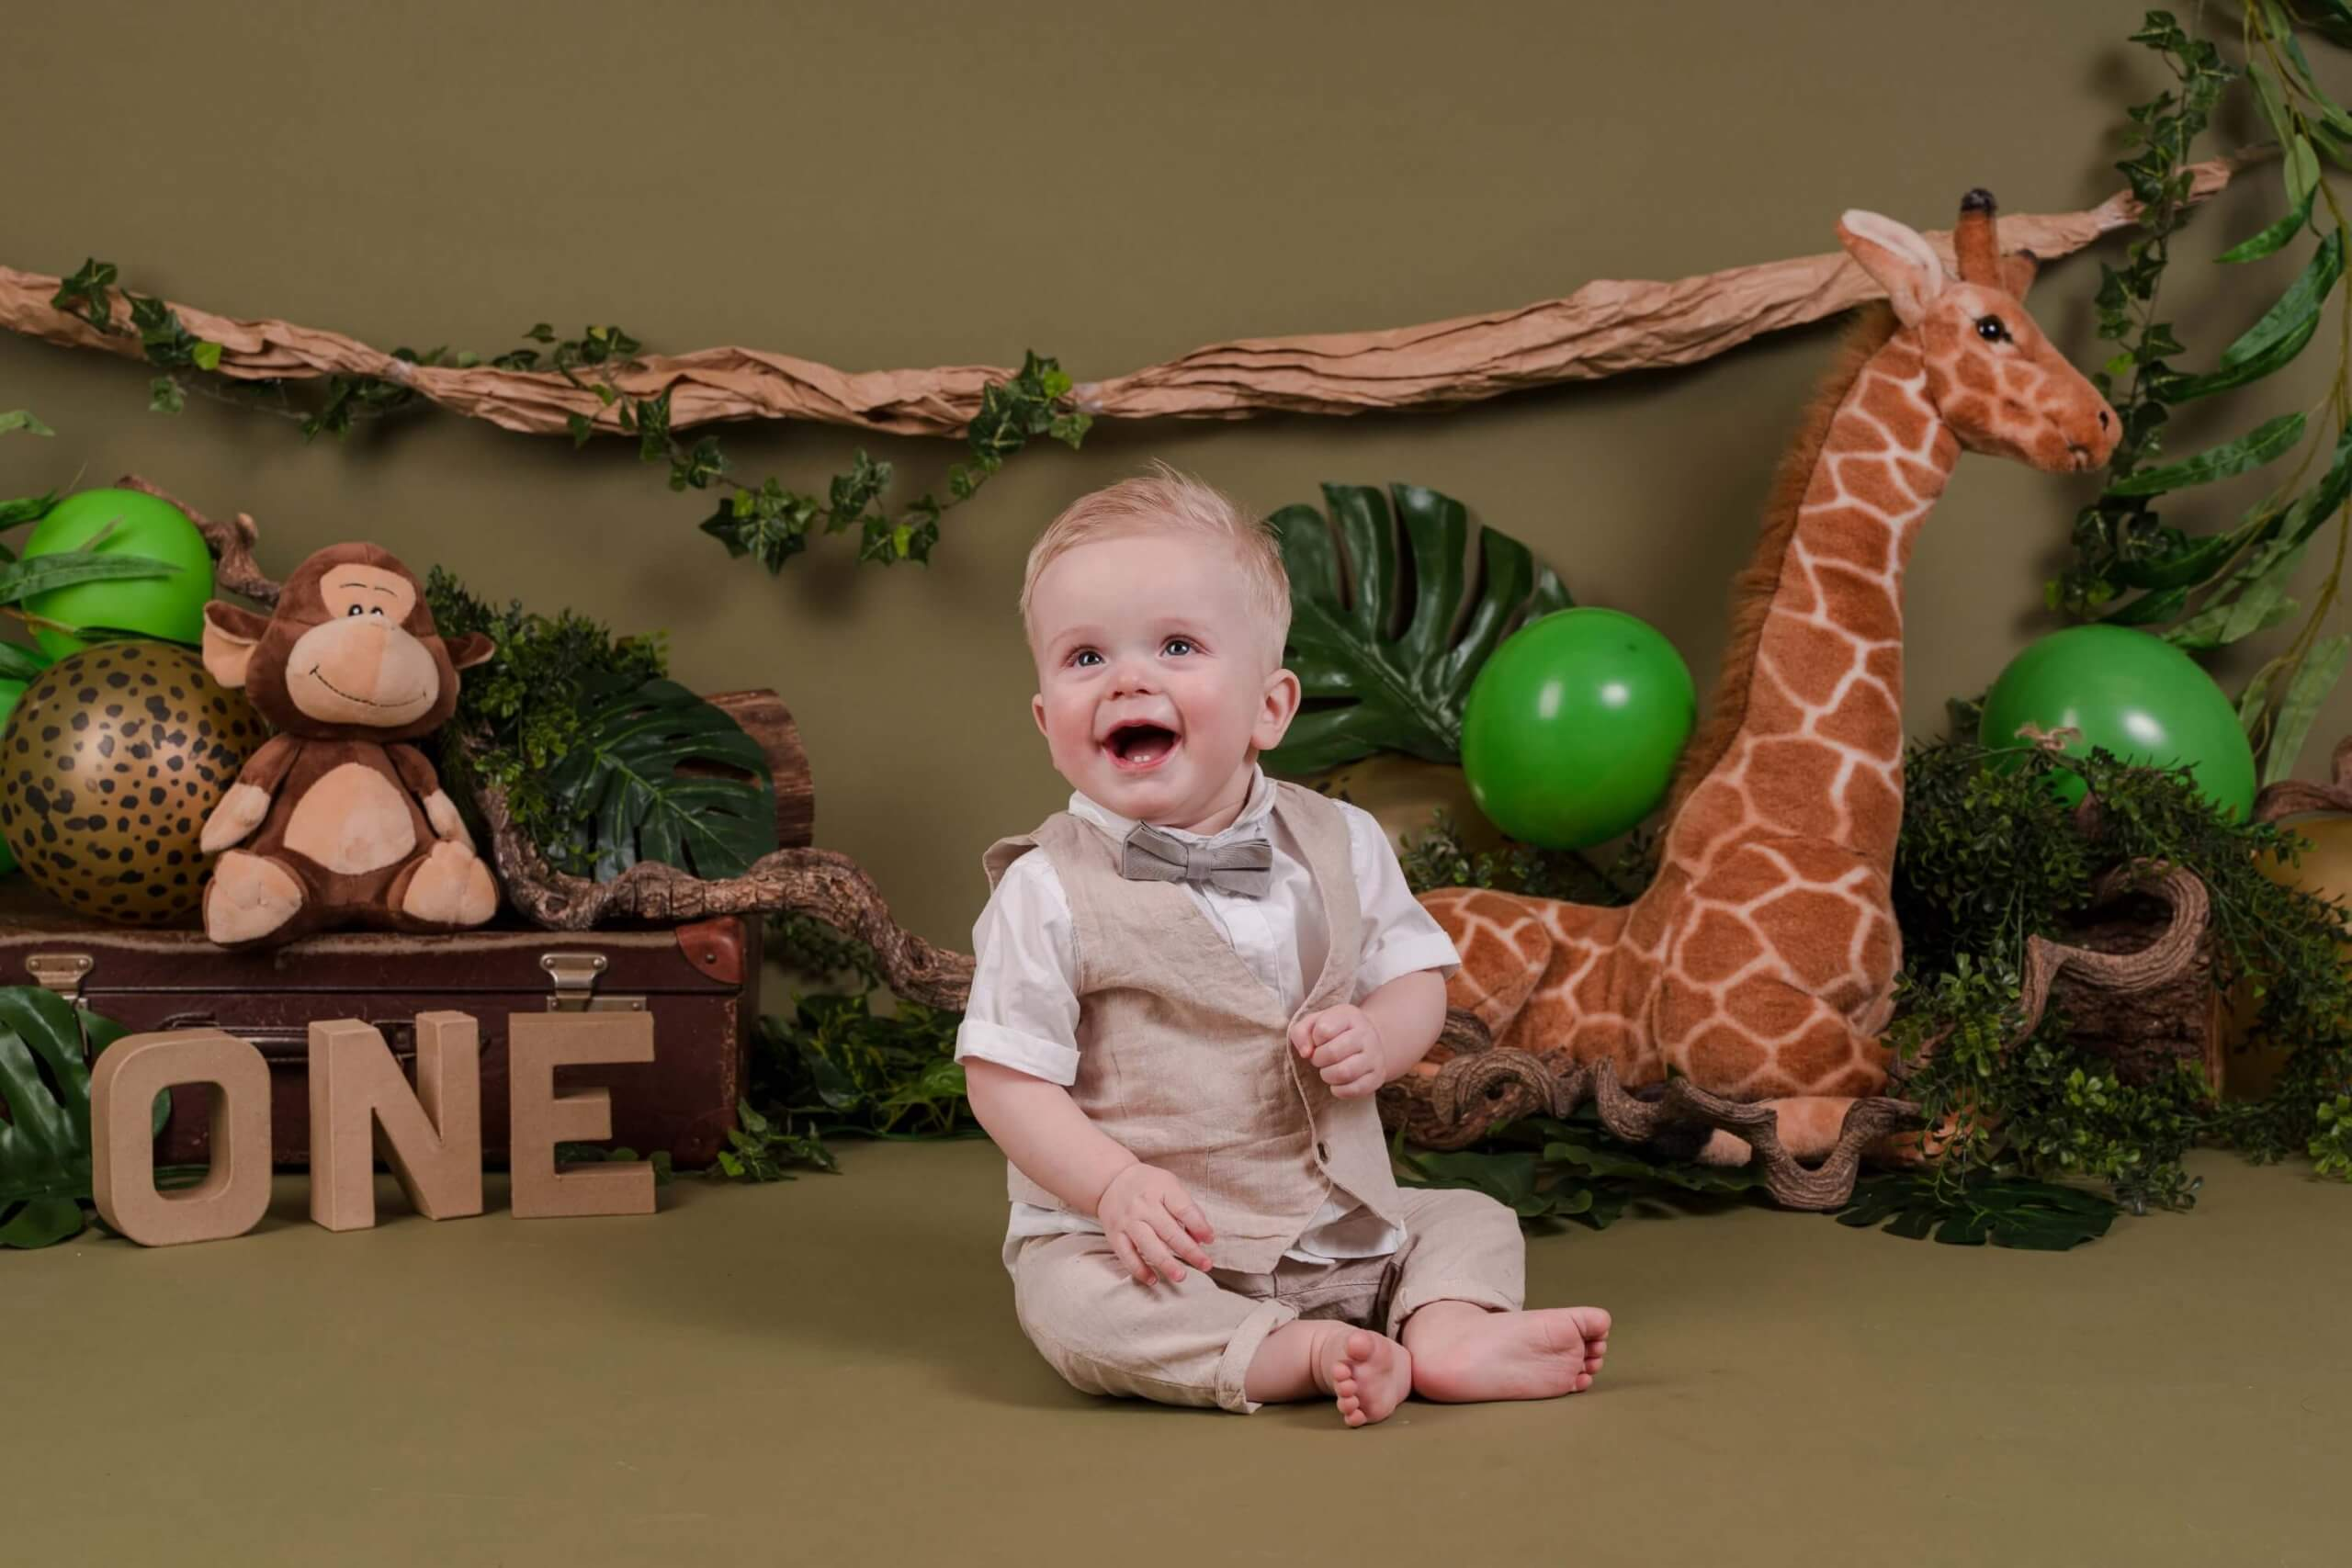 Cake smash jungle thema dieren one jarig feest jongen fotoshoot